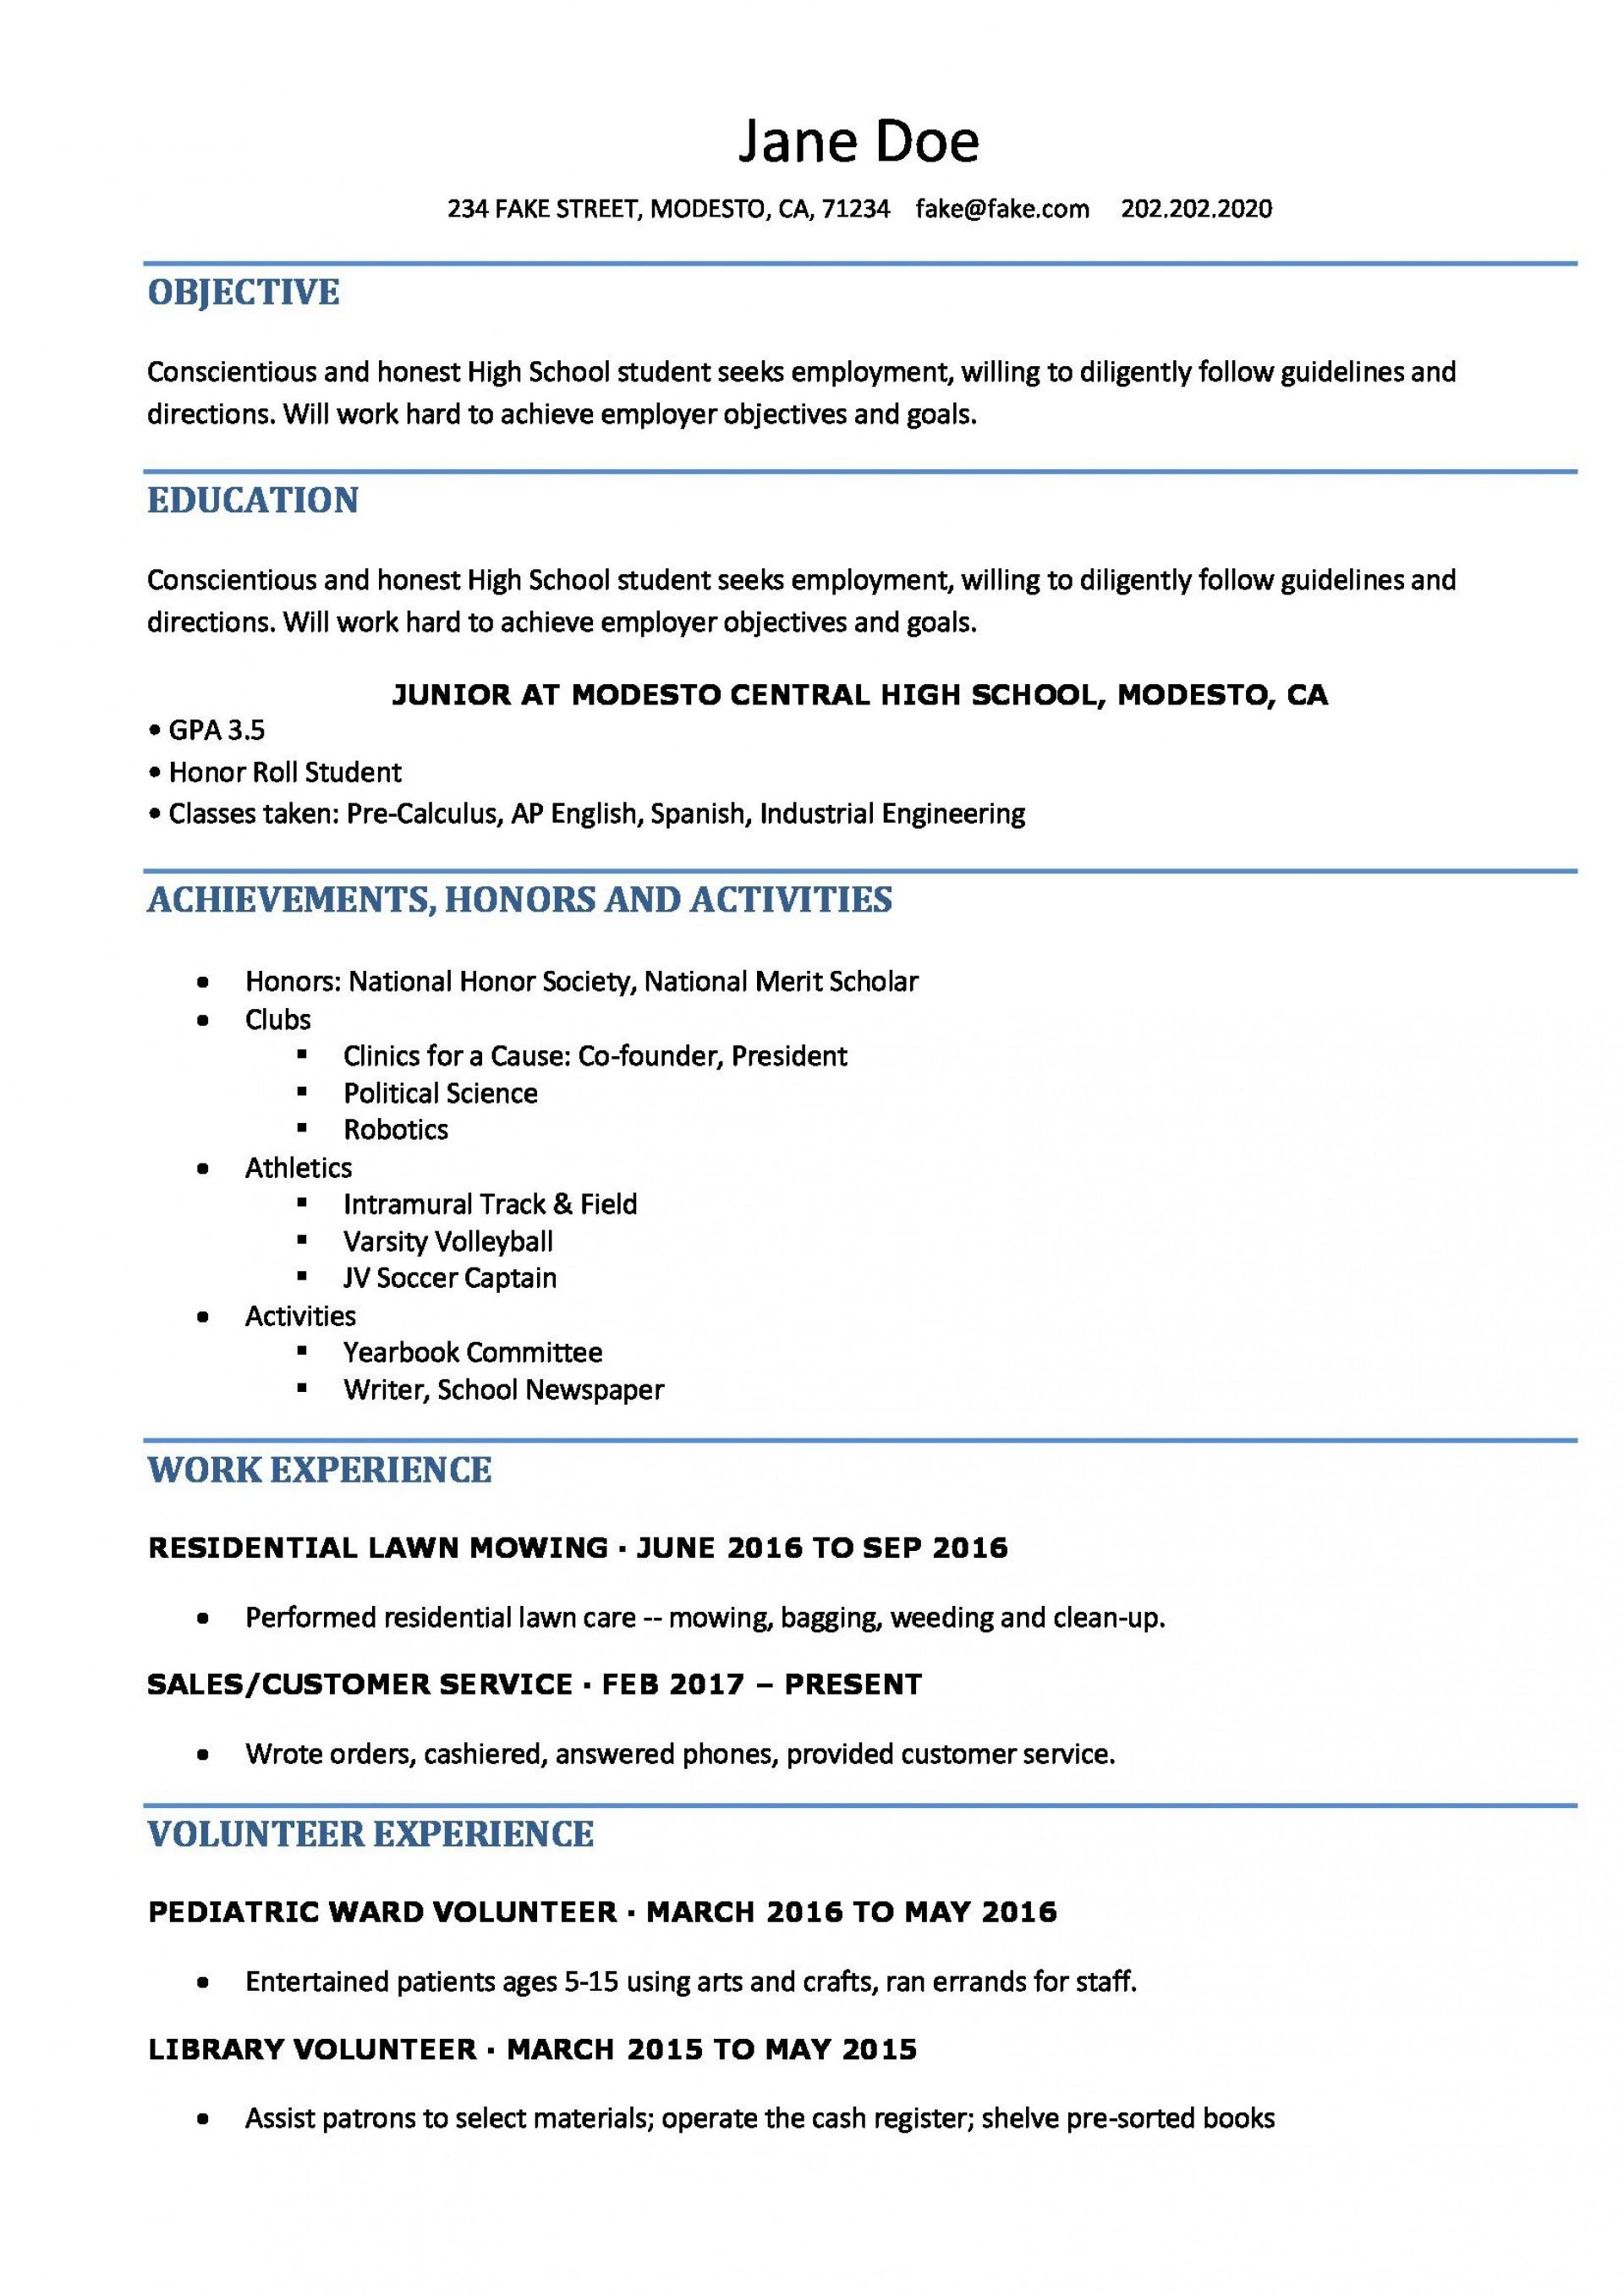 Curriculum Vitae Format For High School Students لم يسبق له مثيل